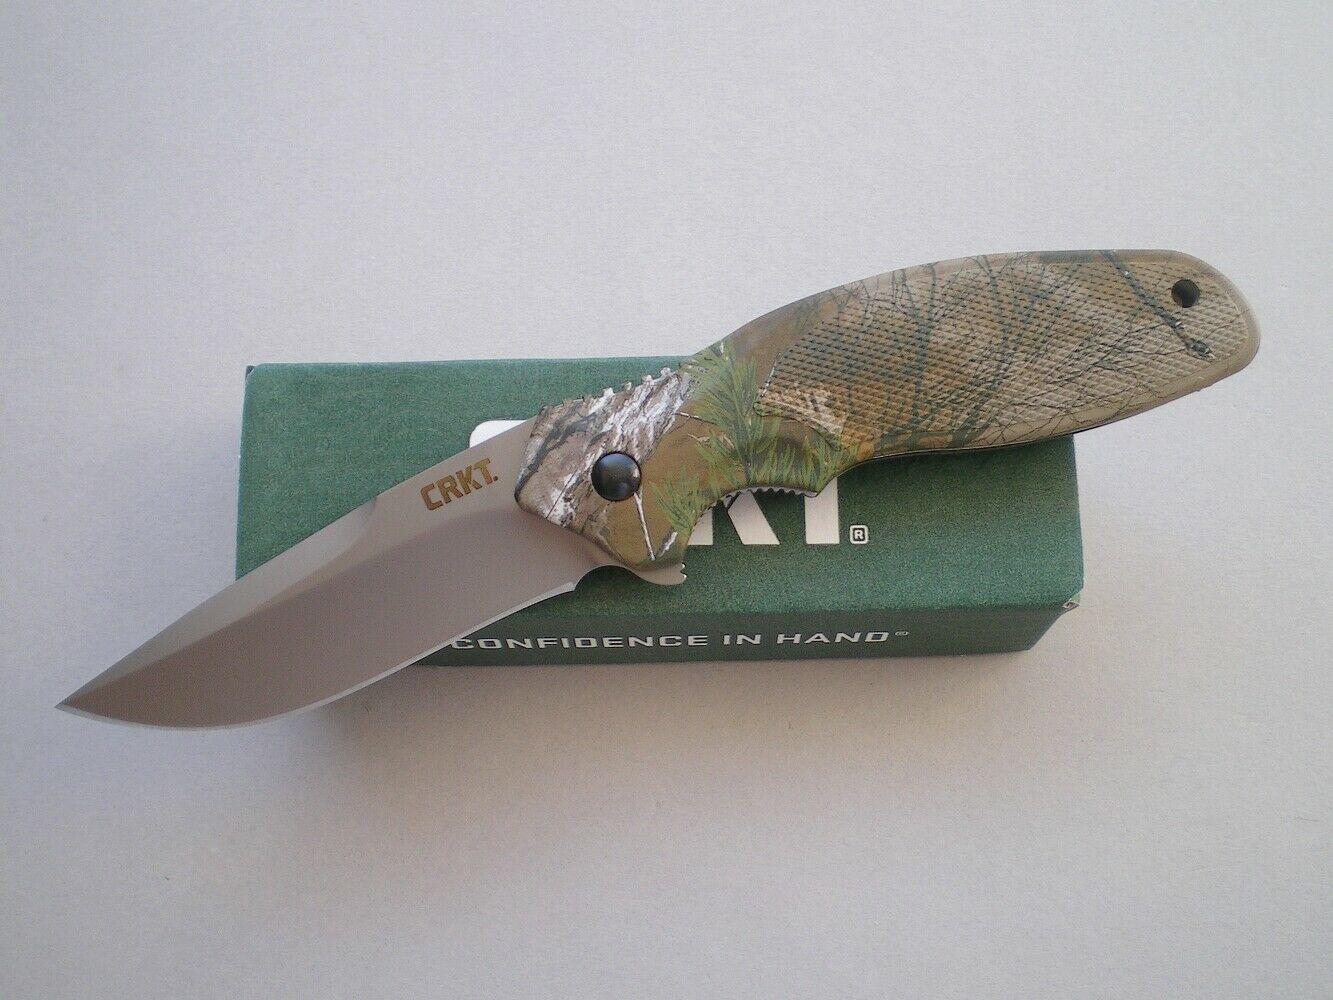 Фото 10 - Складной нож CRKT Shenanigan™ Camo Realtree™ Xtra® Camouflage, сталь AUS-8, рукоять термопластик GRN